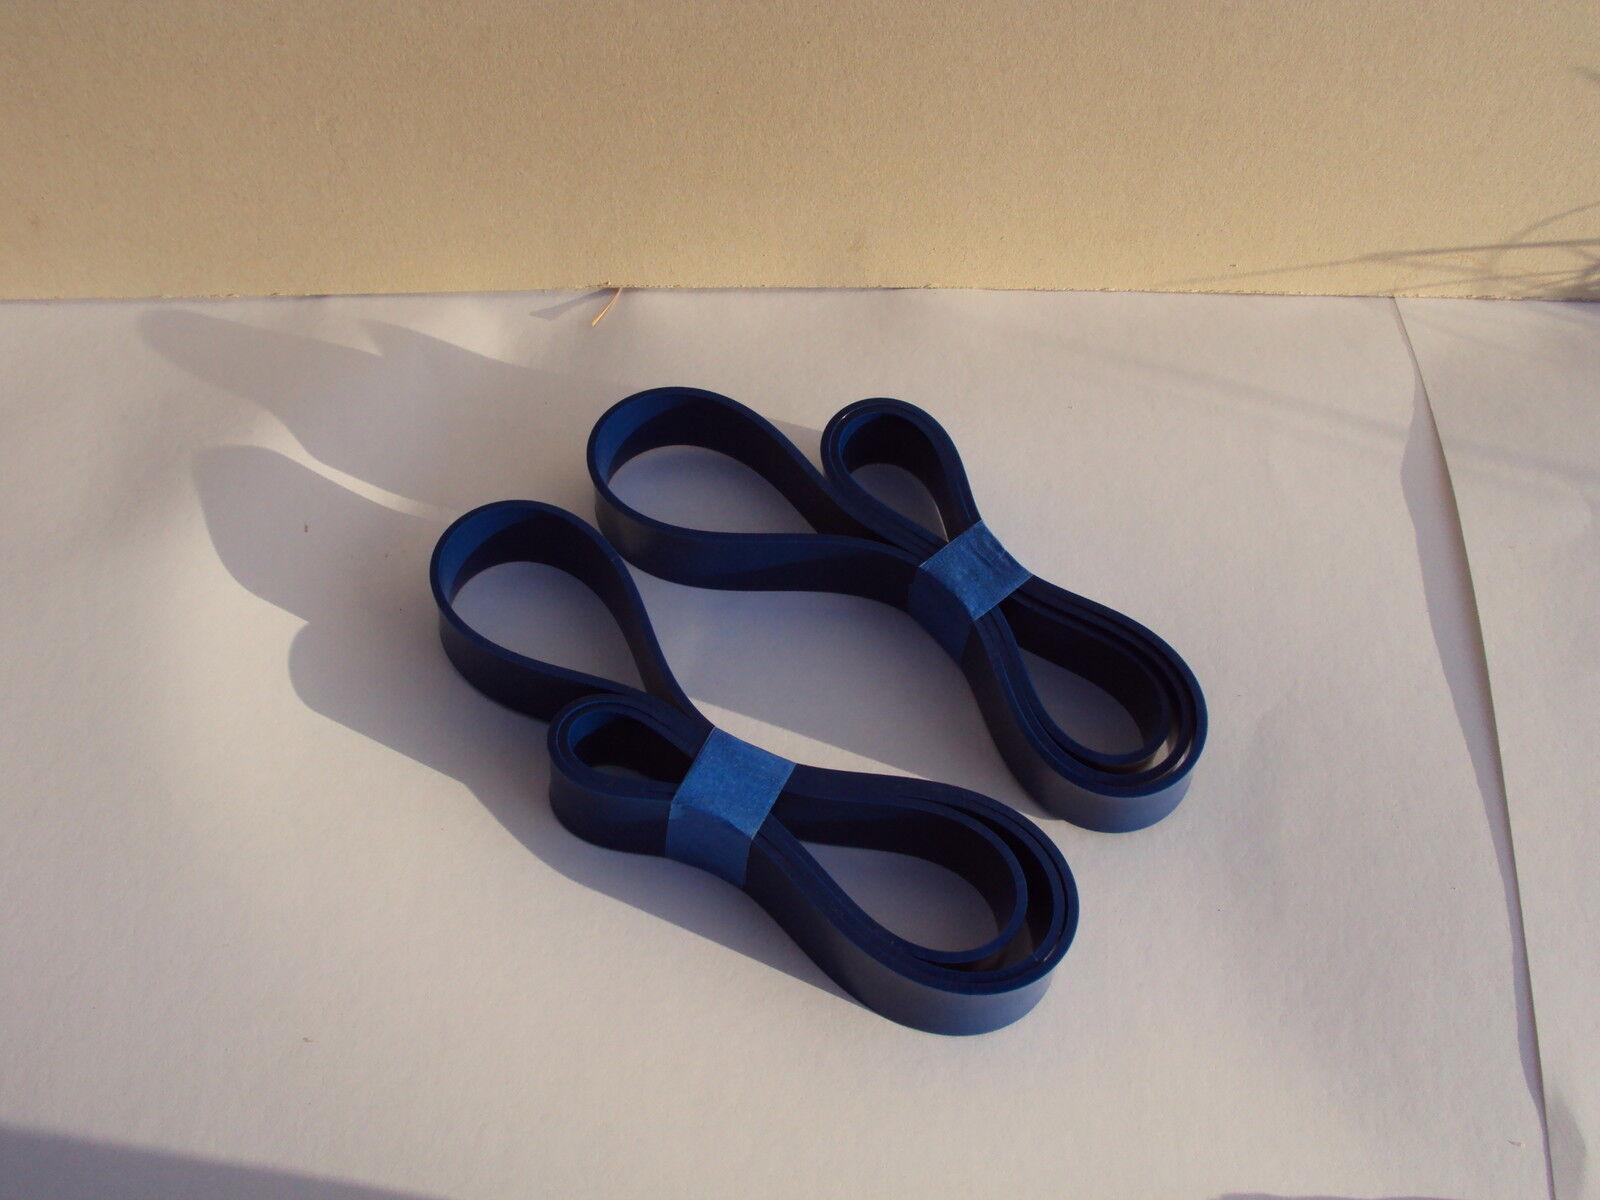 2 BLUE MAX URETHANE BAND SAW TIRES FOR CRAFTSMAN TILT HEAD 113247210 BAND SAW